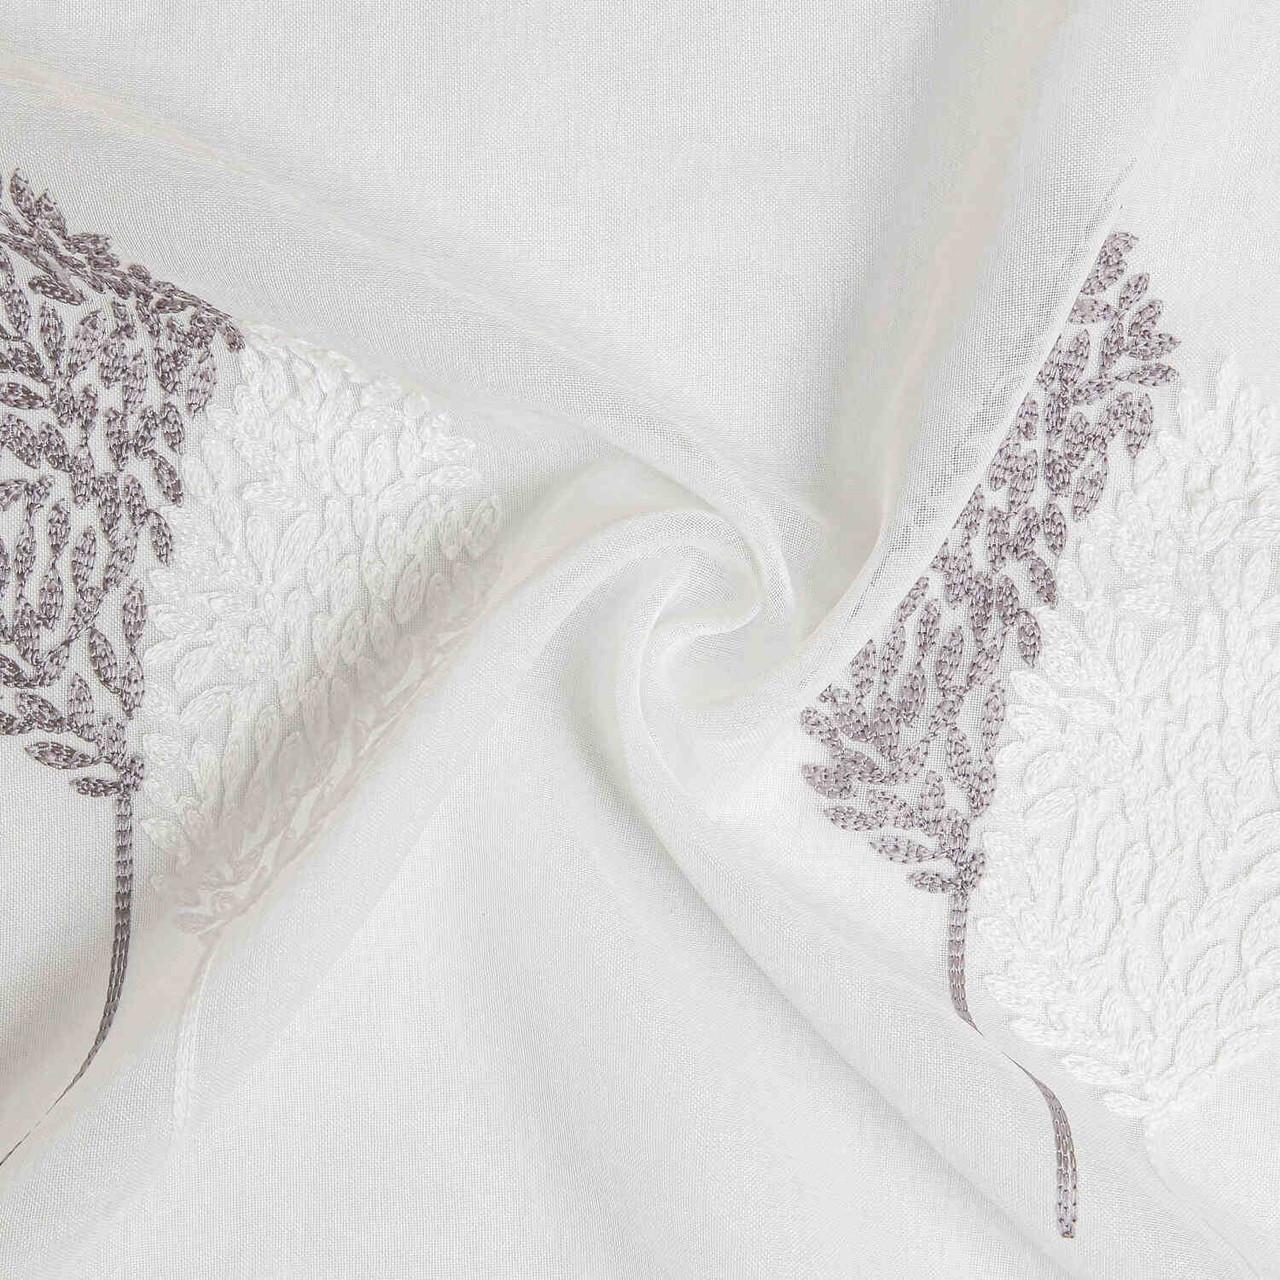 Treatments Sheer Curtain Panel DMC724 Dolce Mela 8171460151600